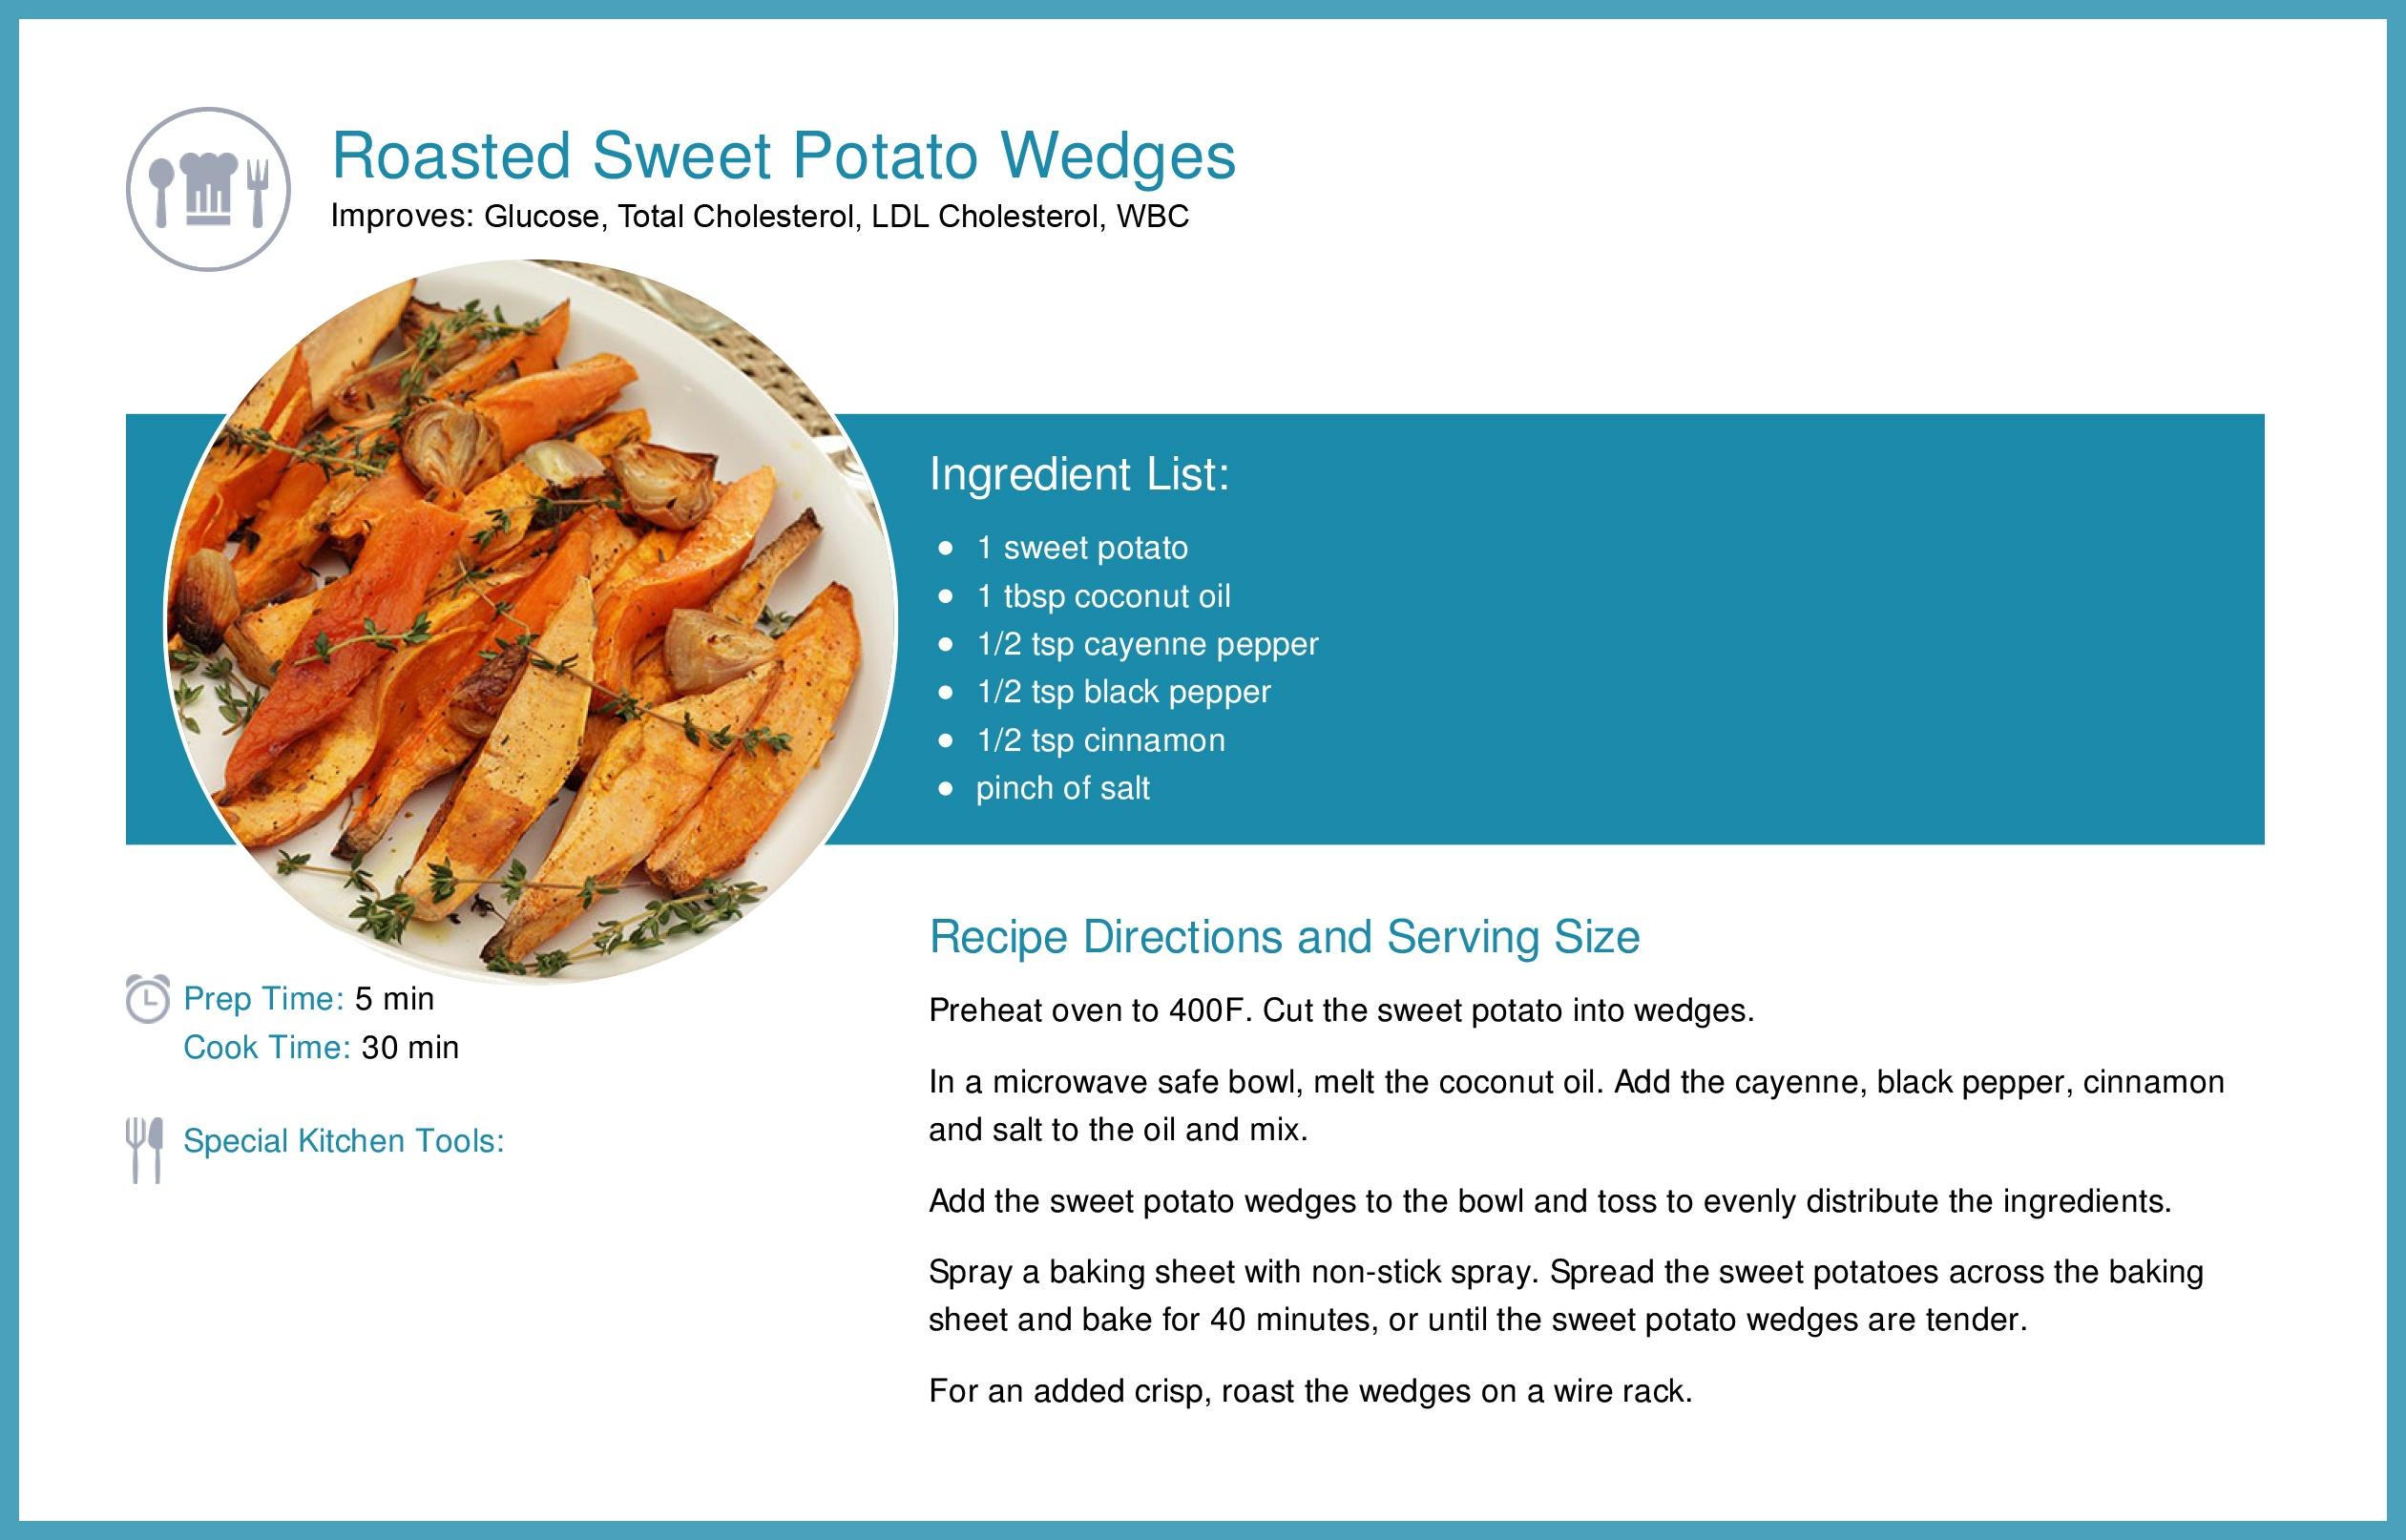 Roasted_Sweet_Potato_Wedges-updated-2.jpg